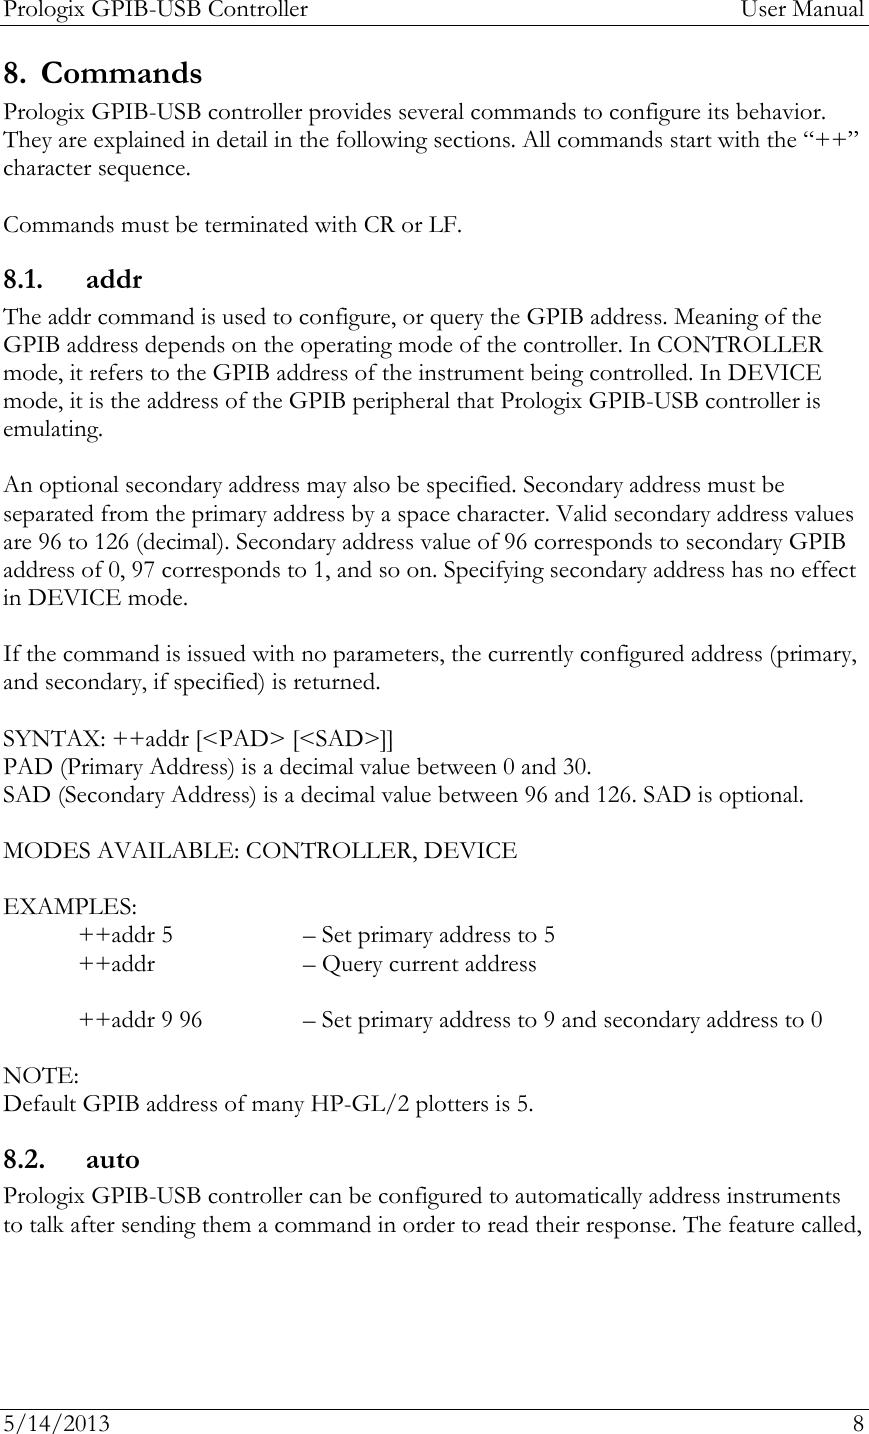 PROLOGIX Gpib Usb Manual 6 0